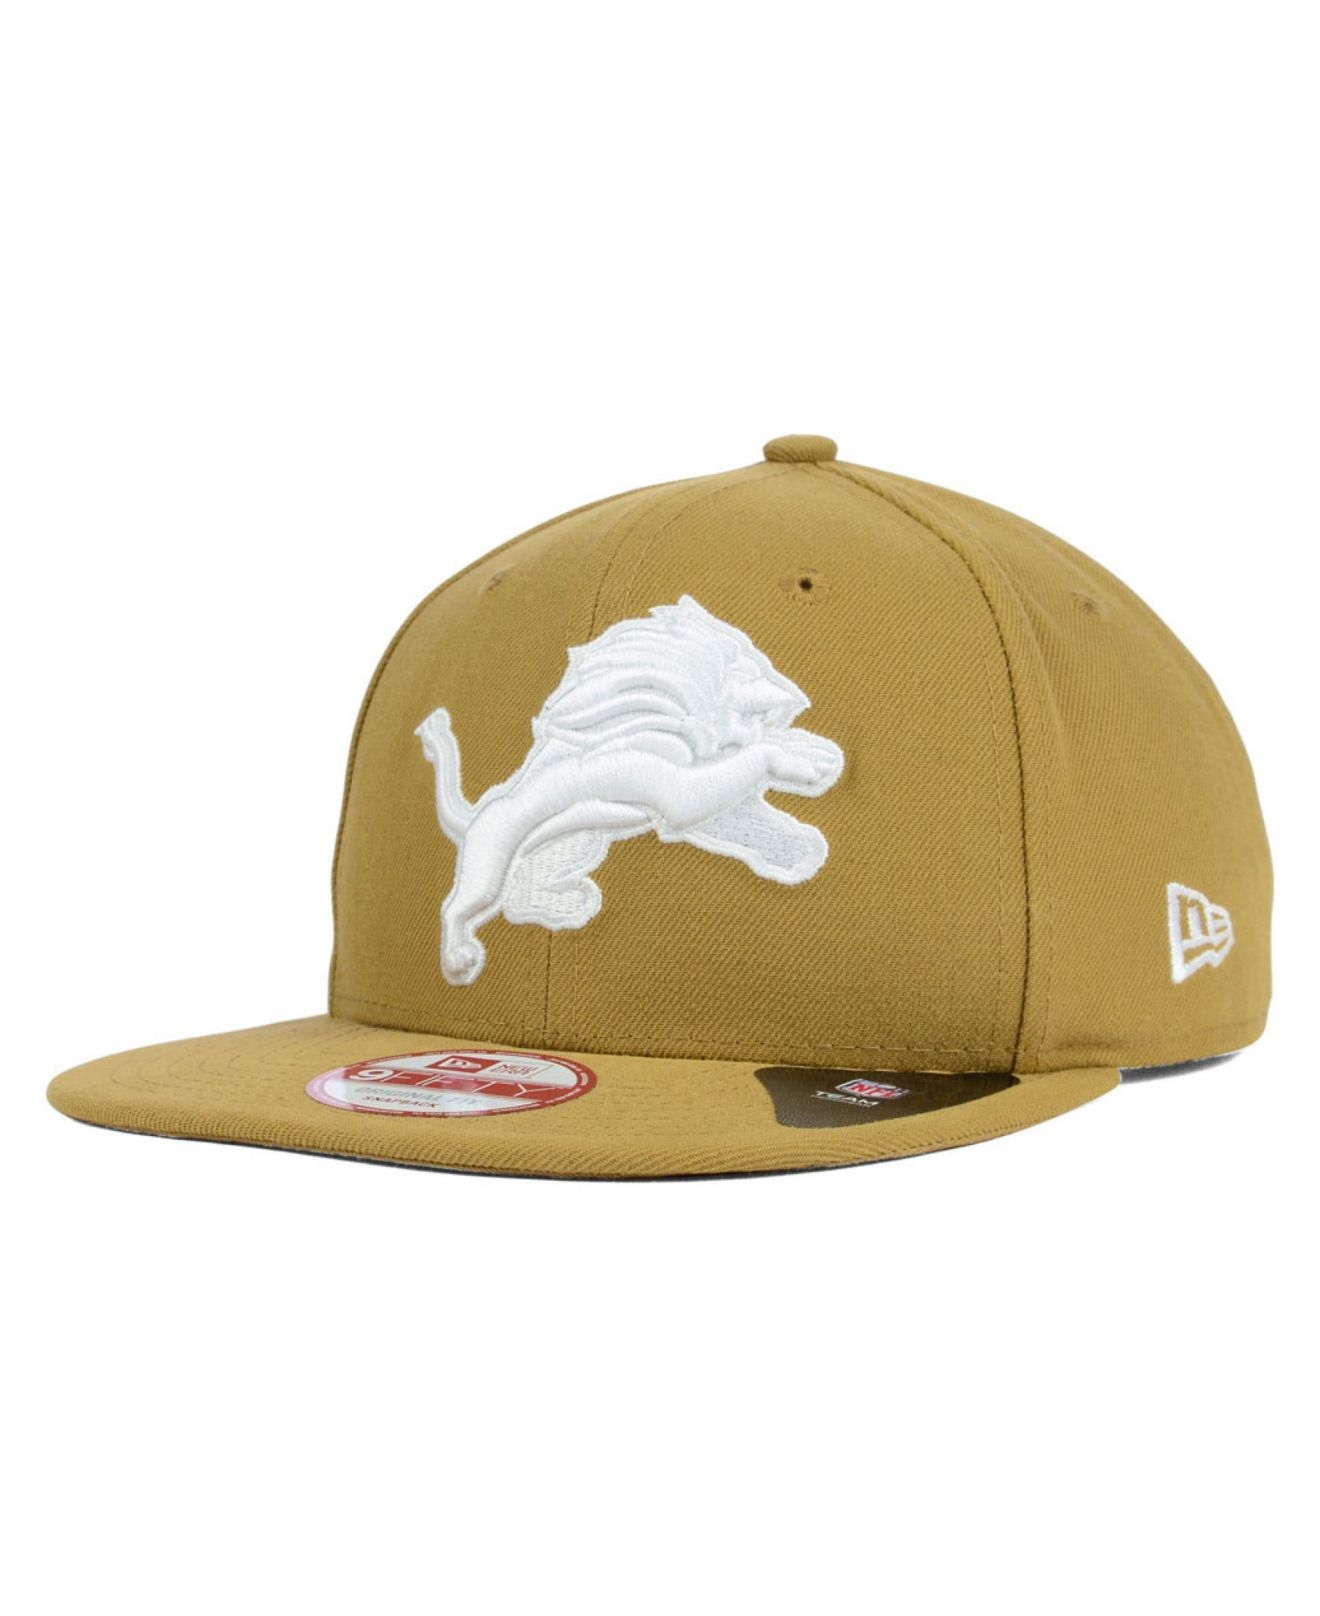 25efb80bfd4 ... greece lyst ktz detroit lions original fit 9fifty snapback cap in  natural 8c74f 08d92